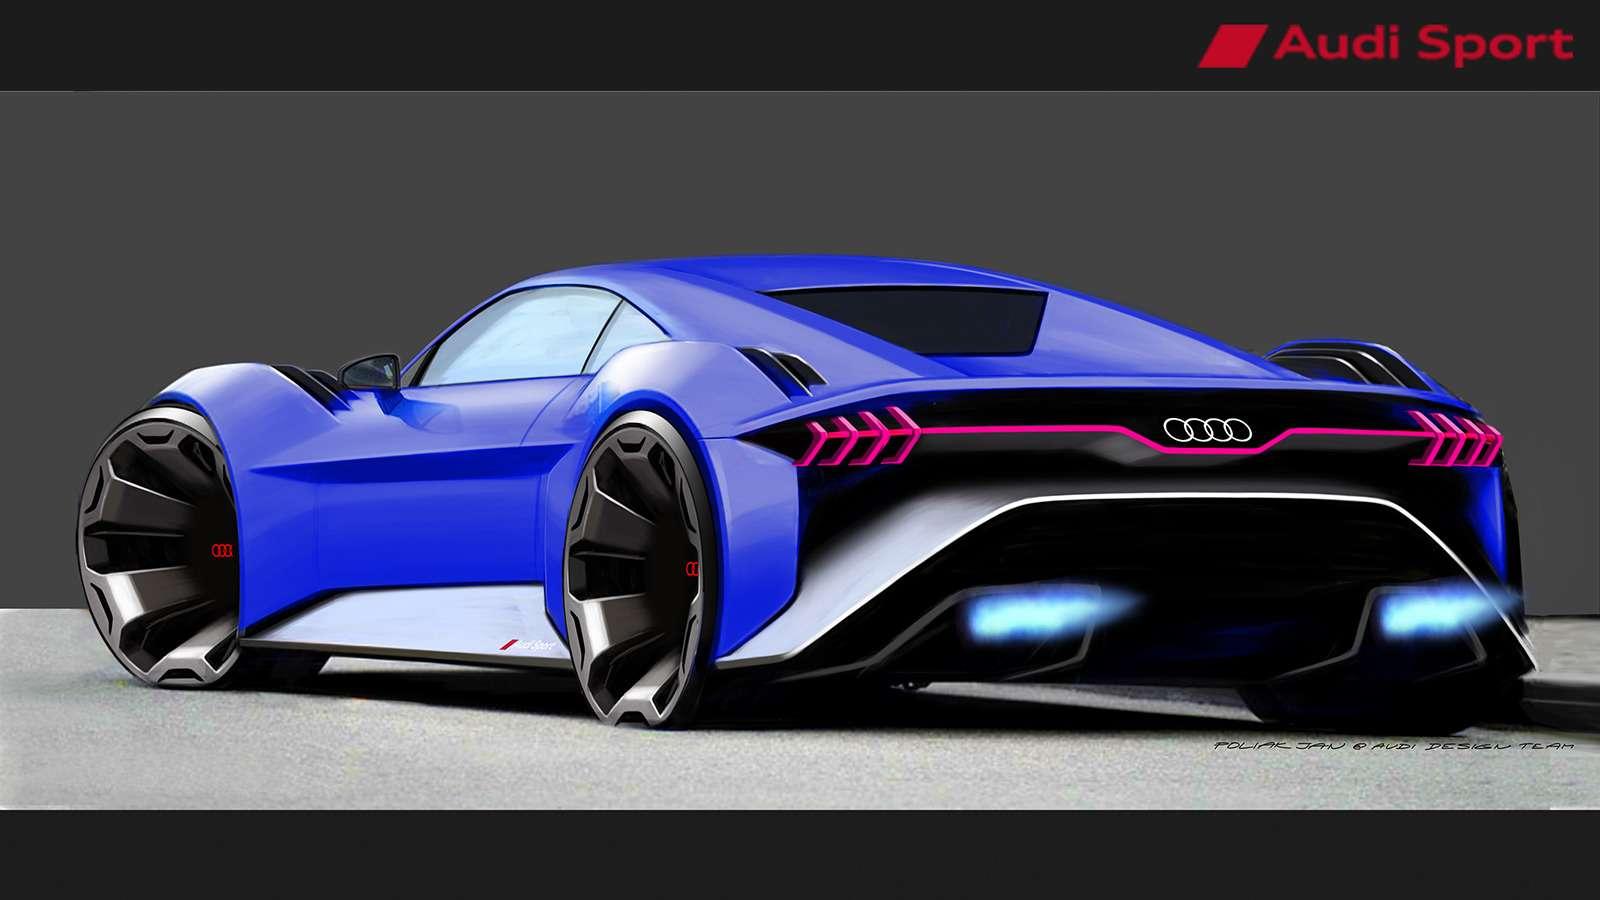 В Audi сделали суперкар длянарисованного Уилла Смита— фото 919674